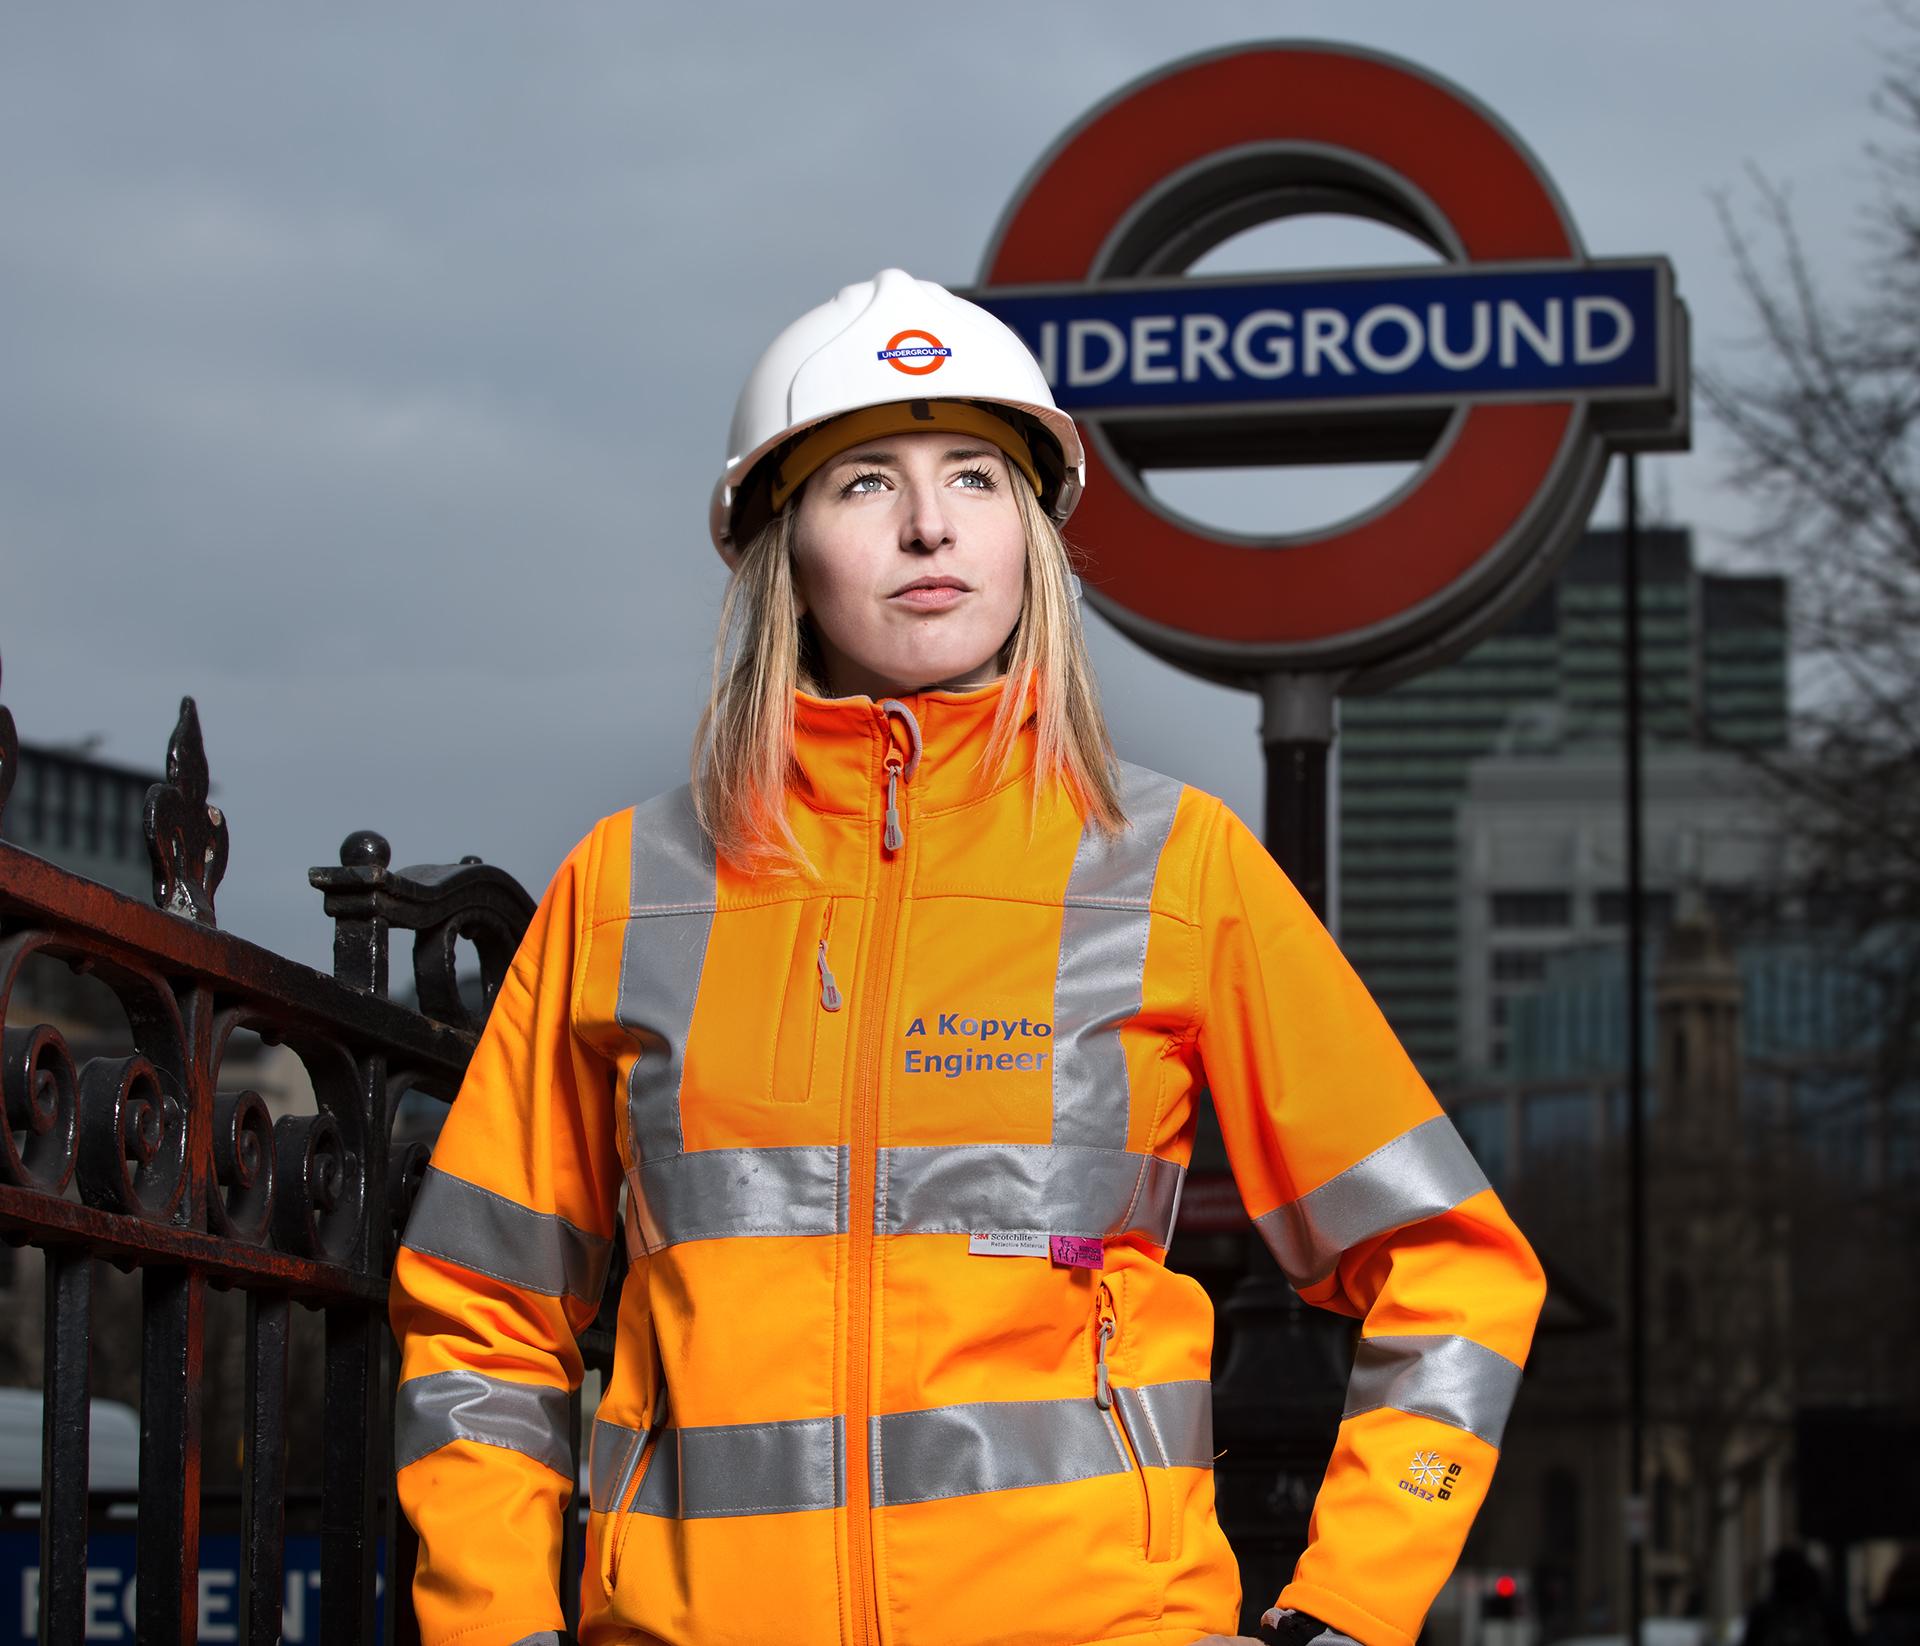 Anna Kopyto / Project Engineer at TfL.